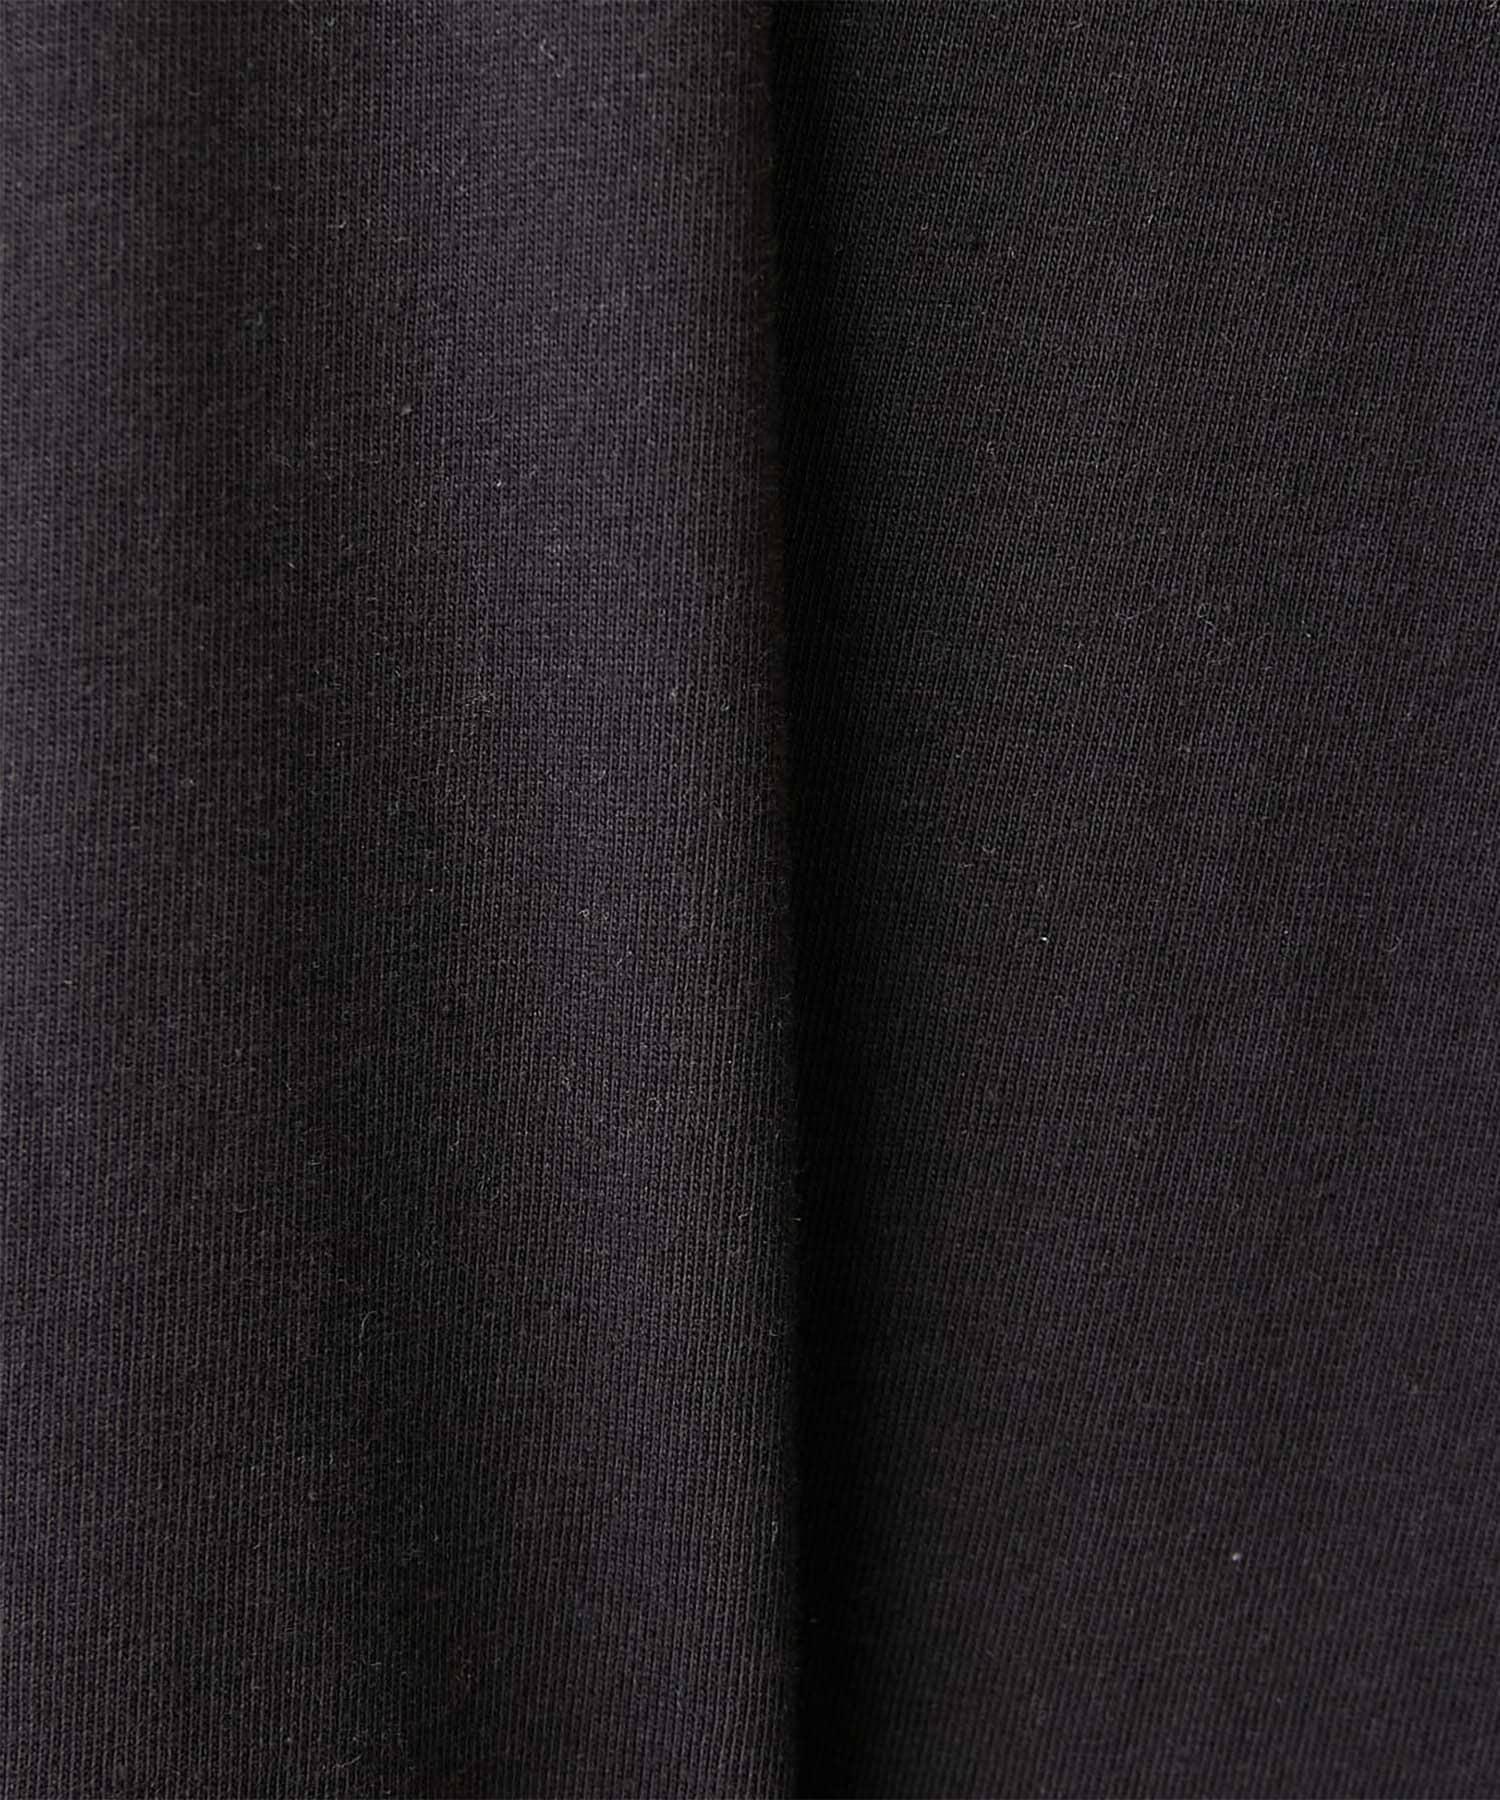 GALLARDAGALANTE(ガリャルダガランテ) ドレープアシメカットソーワンピース【オンラインストア限定商品】